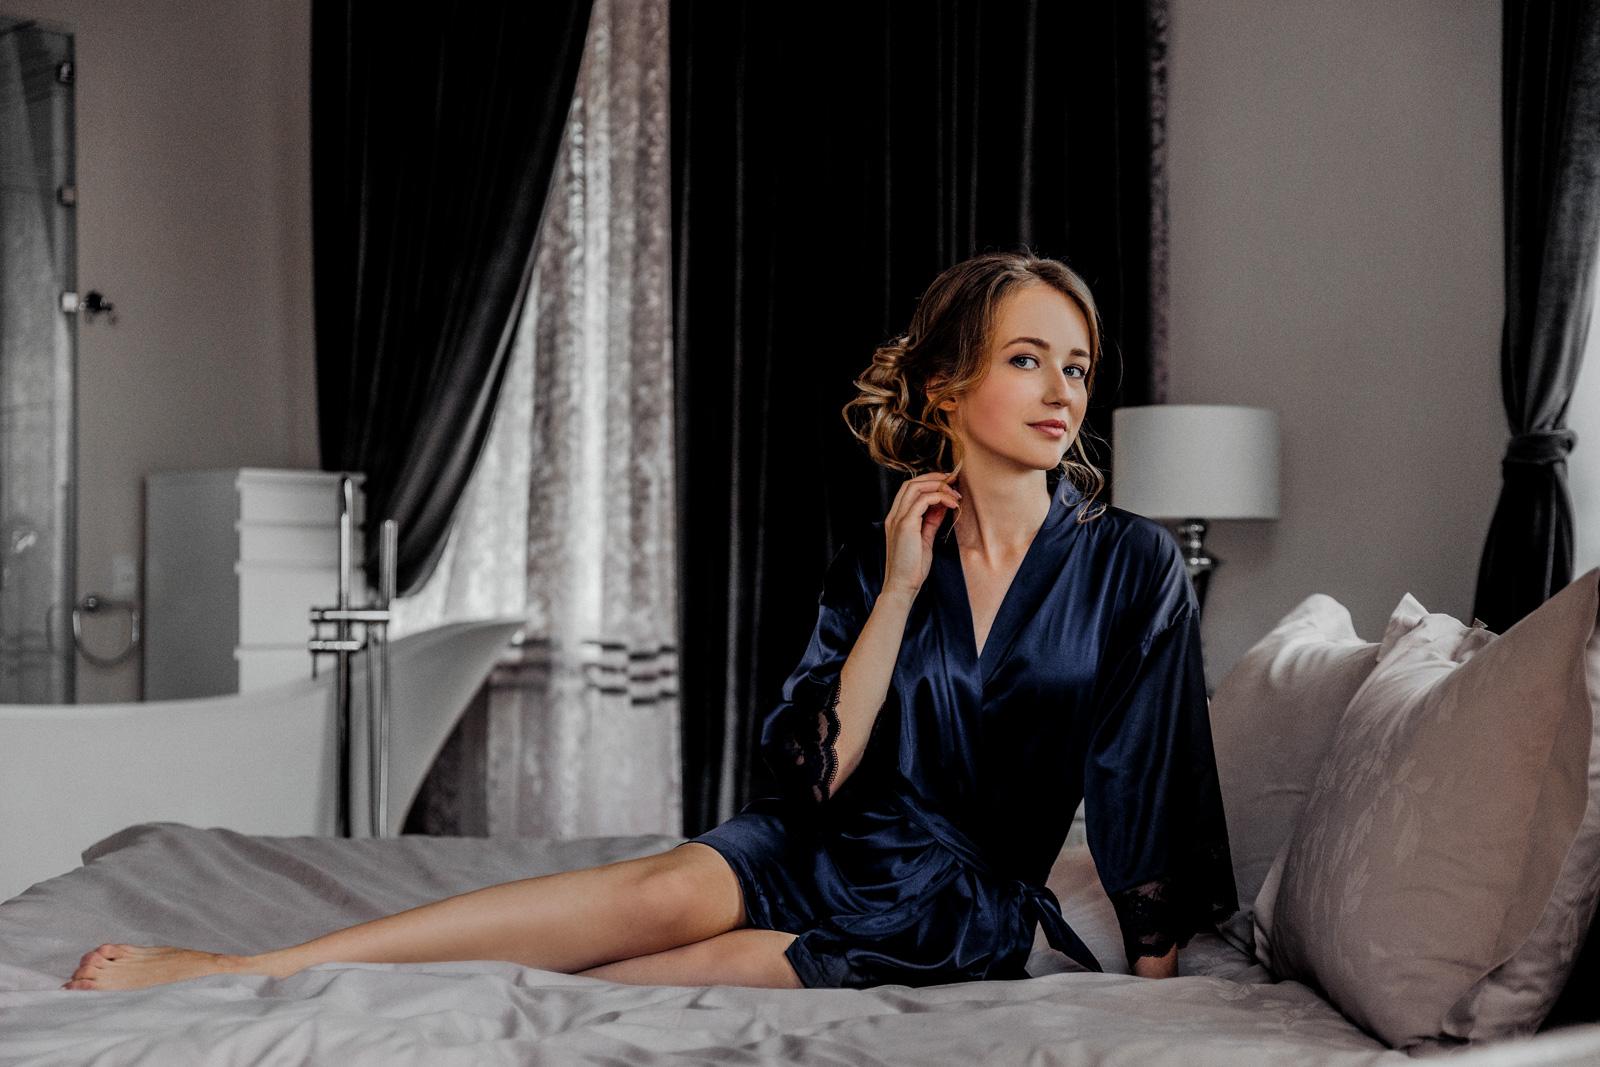 На берегу неба - Фотограф Виктория Куприна